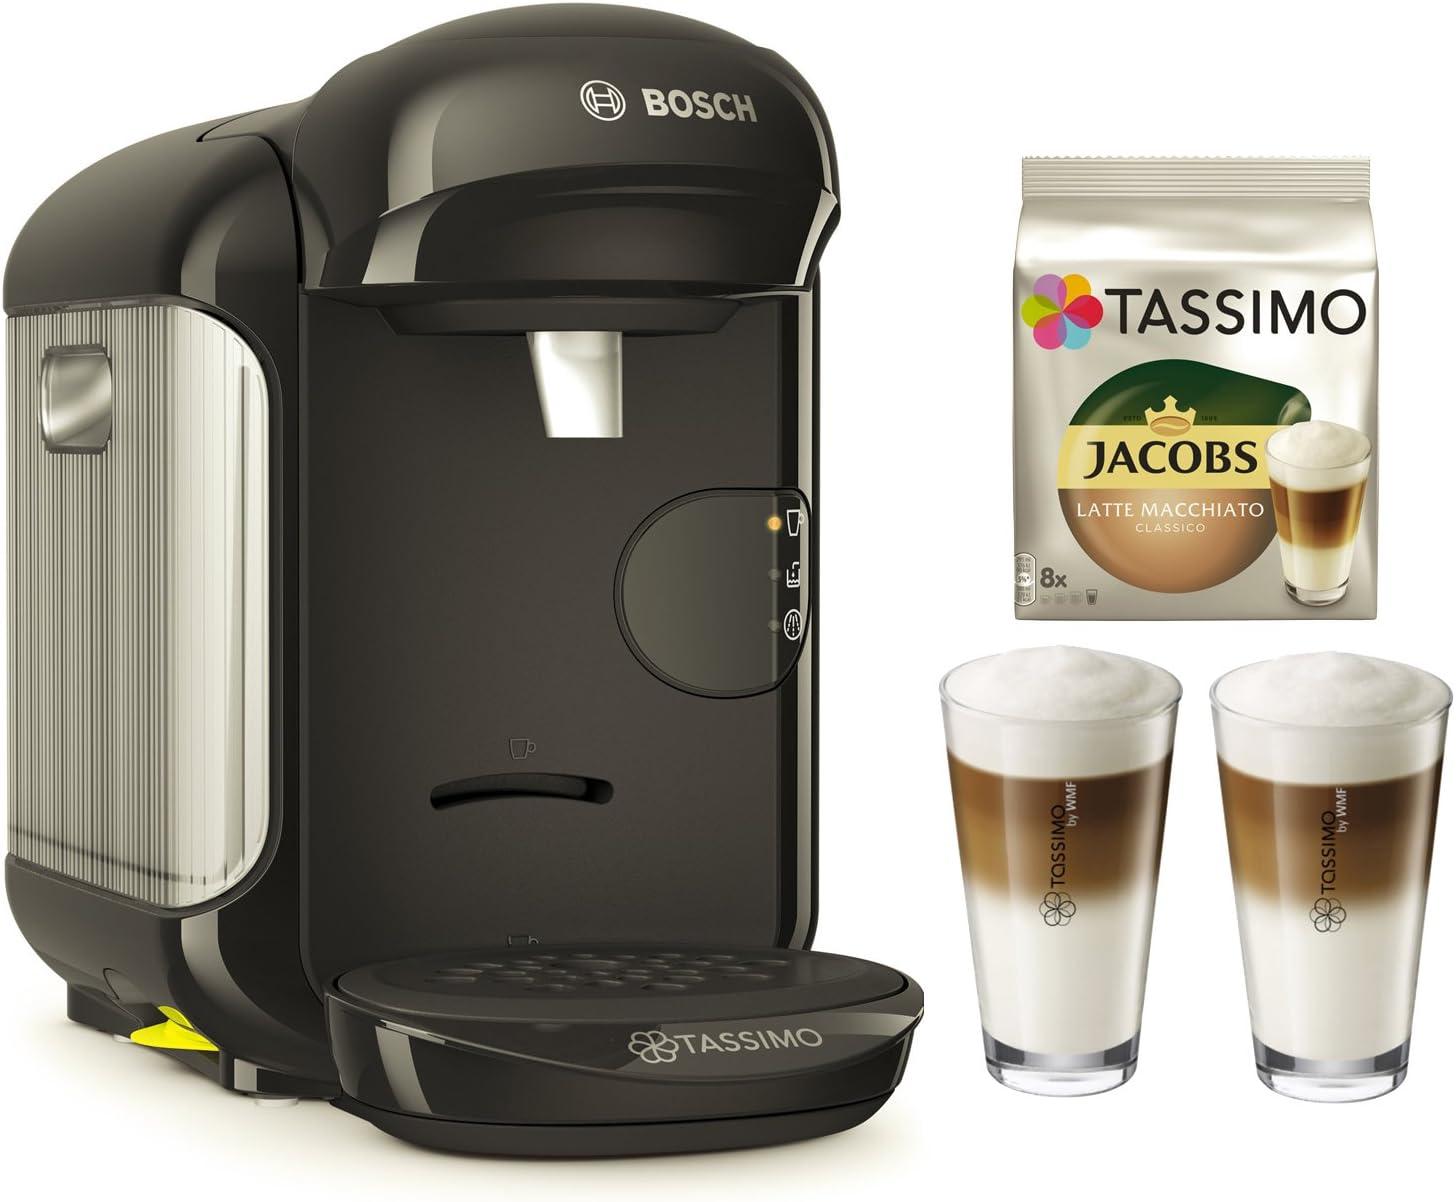 Cafetera Tassimo Vivy 2 de Bosch Bundle + vasos de latte macchiato + Tdisc Latte Macchiato Negro: Amazon.es: Hogar